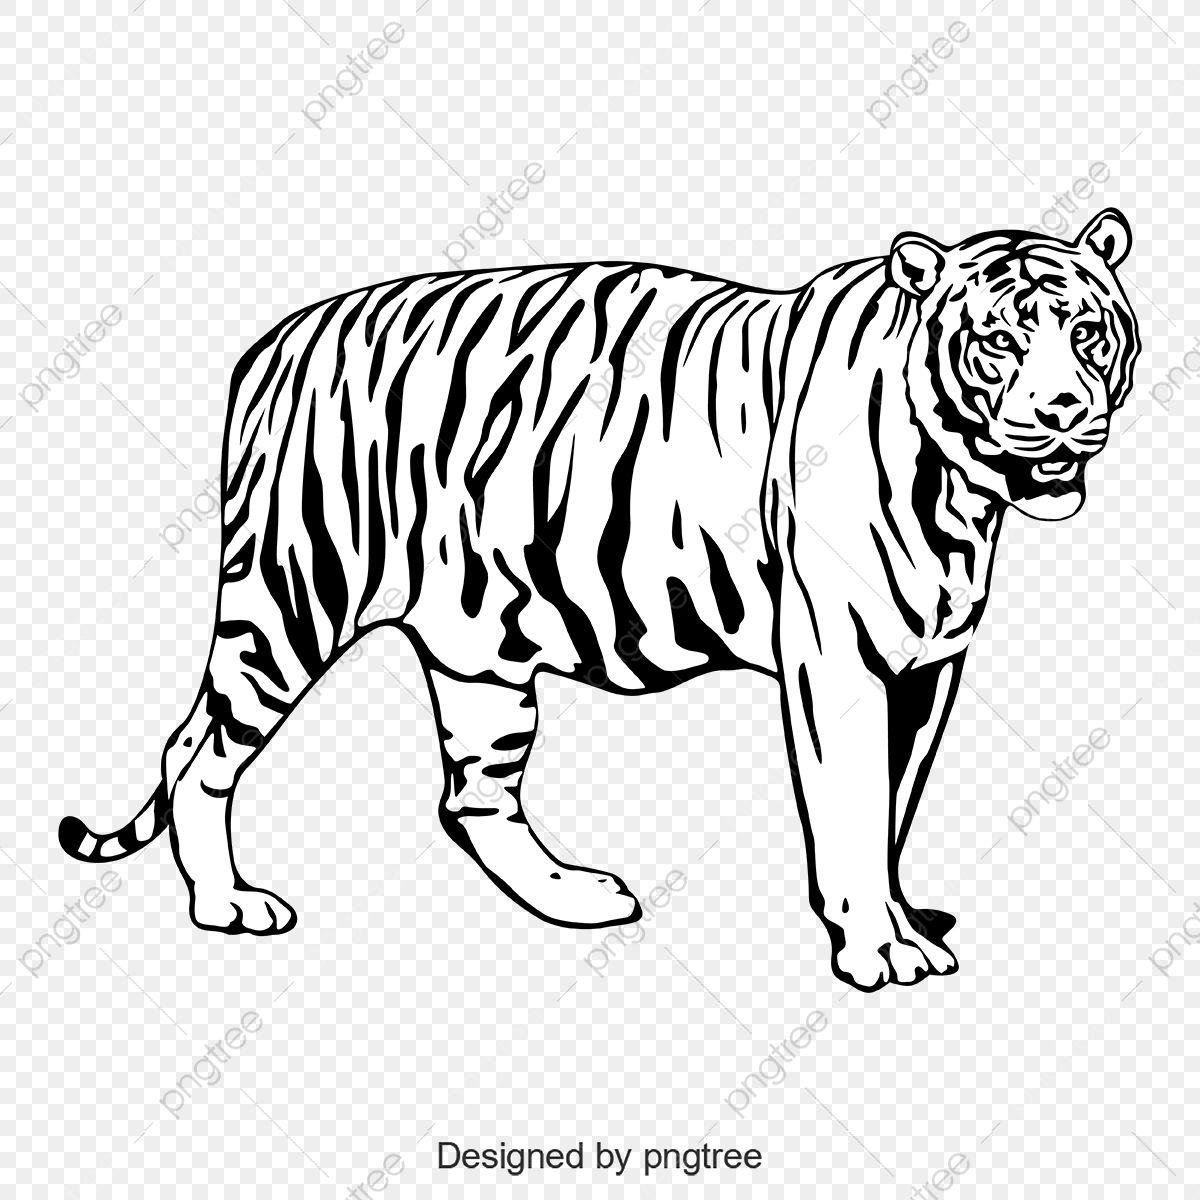 Hitam Dan Putih Harimau Seluruh Badan Seperti Bayang Haiwan Cahaya Png Dan Vektor Untuk Muat Turun Percuma Menggambar Harimau Kartun Gambar Hewan